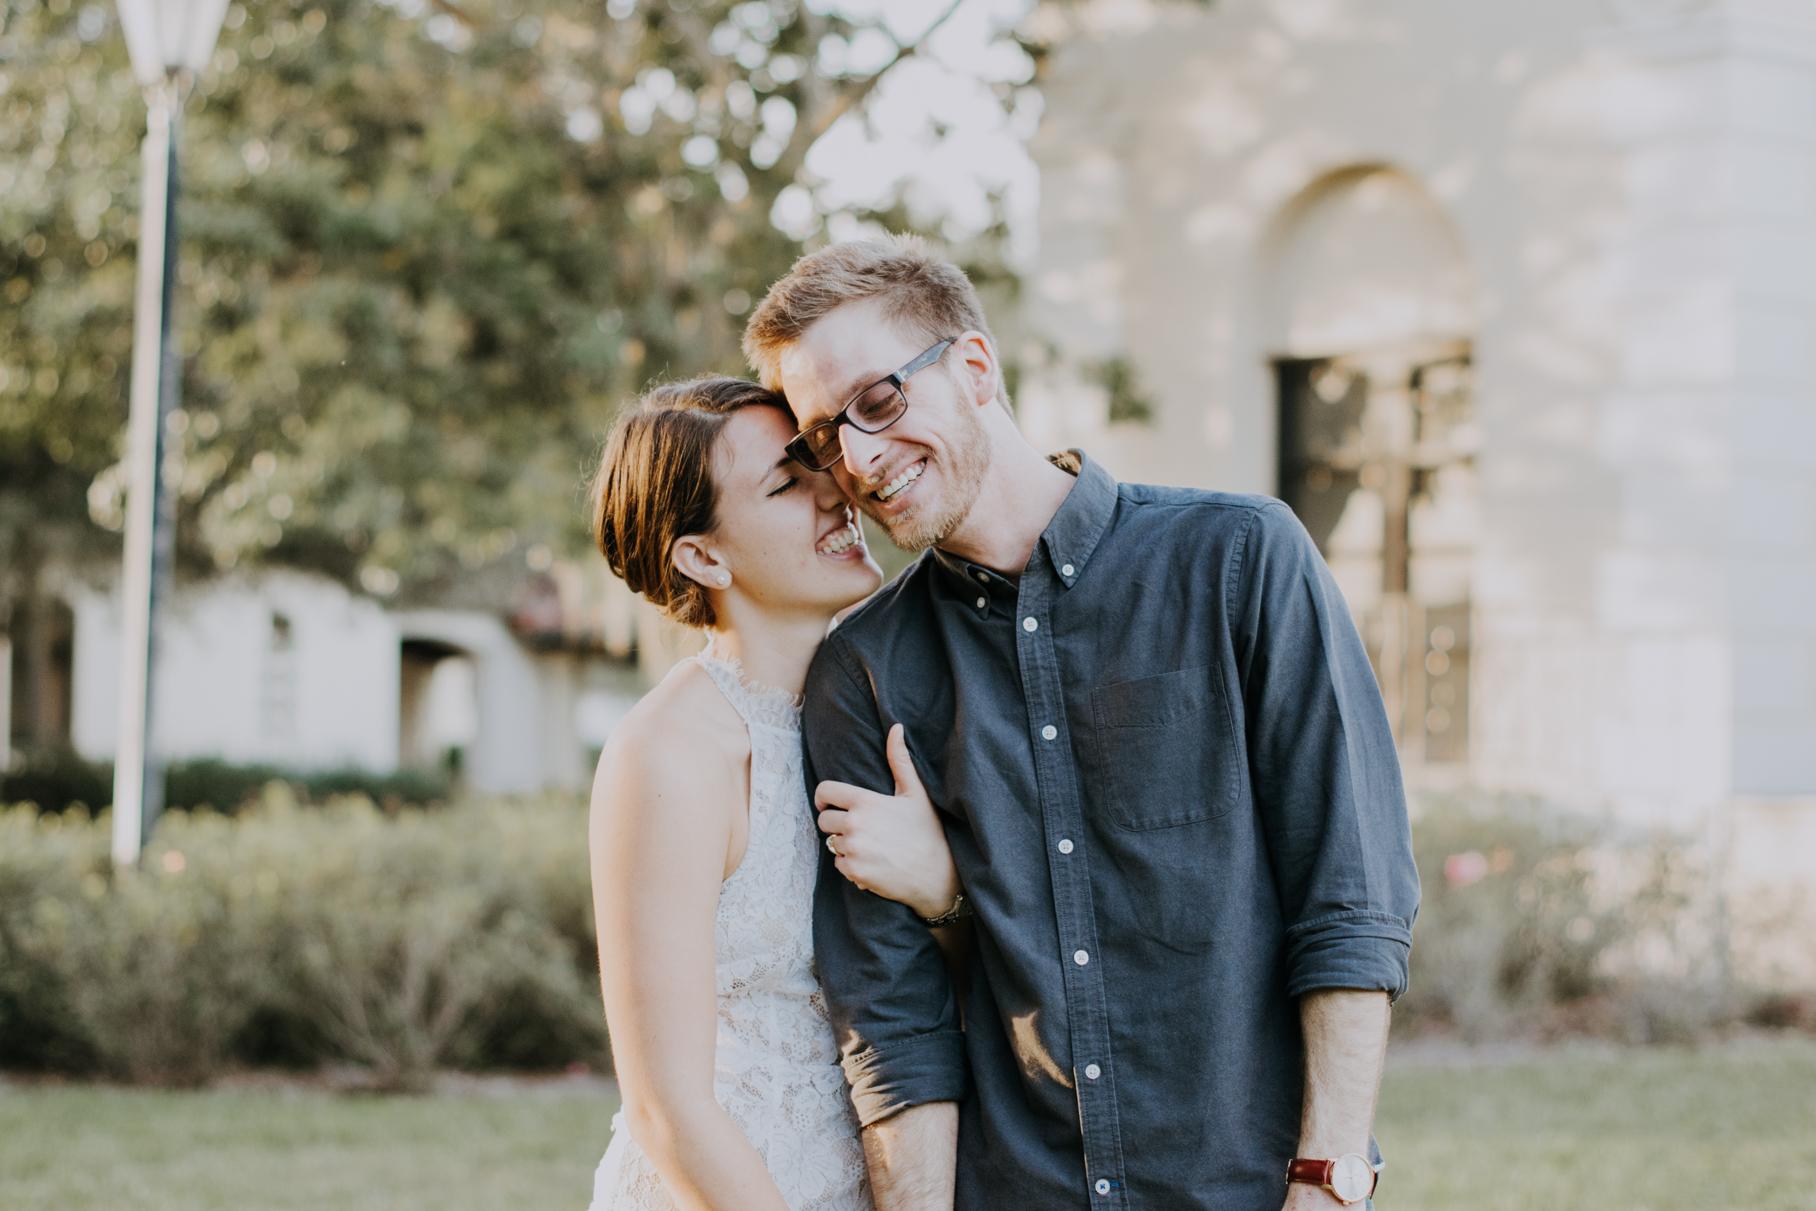 kayla + nathan | rollins college proposal | tampa wedding photographer